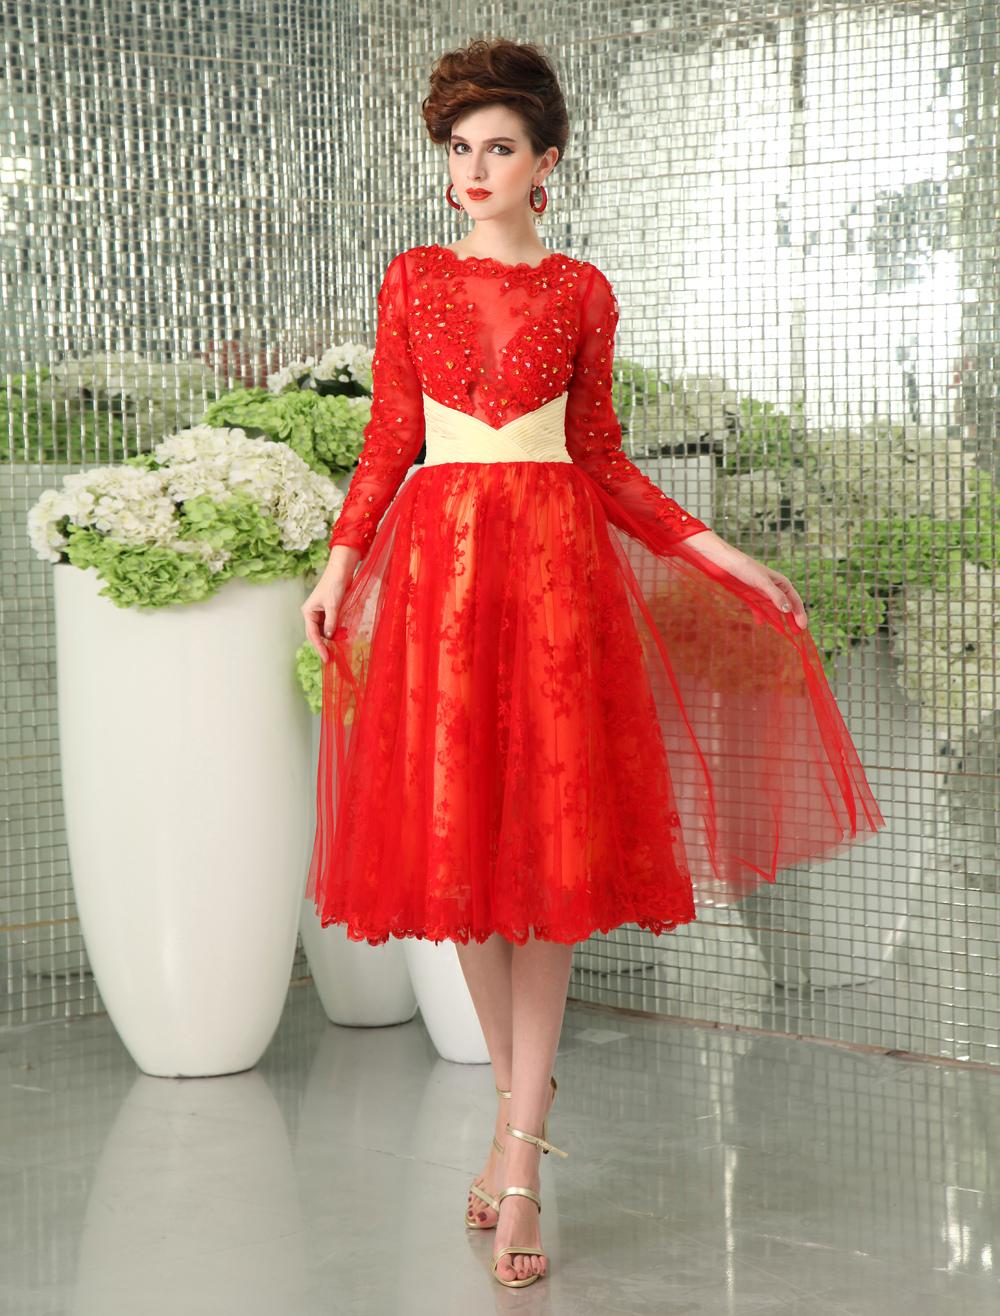 Elegant Red Lace Bateau Neck Women's Evening Dress Milanoo (Wedding Cocktail Dresses) photo